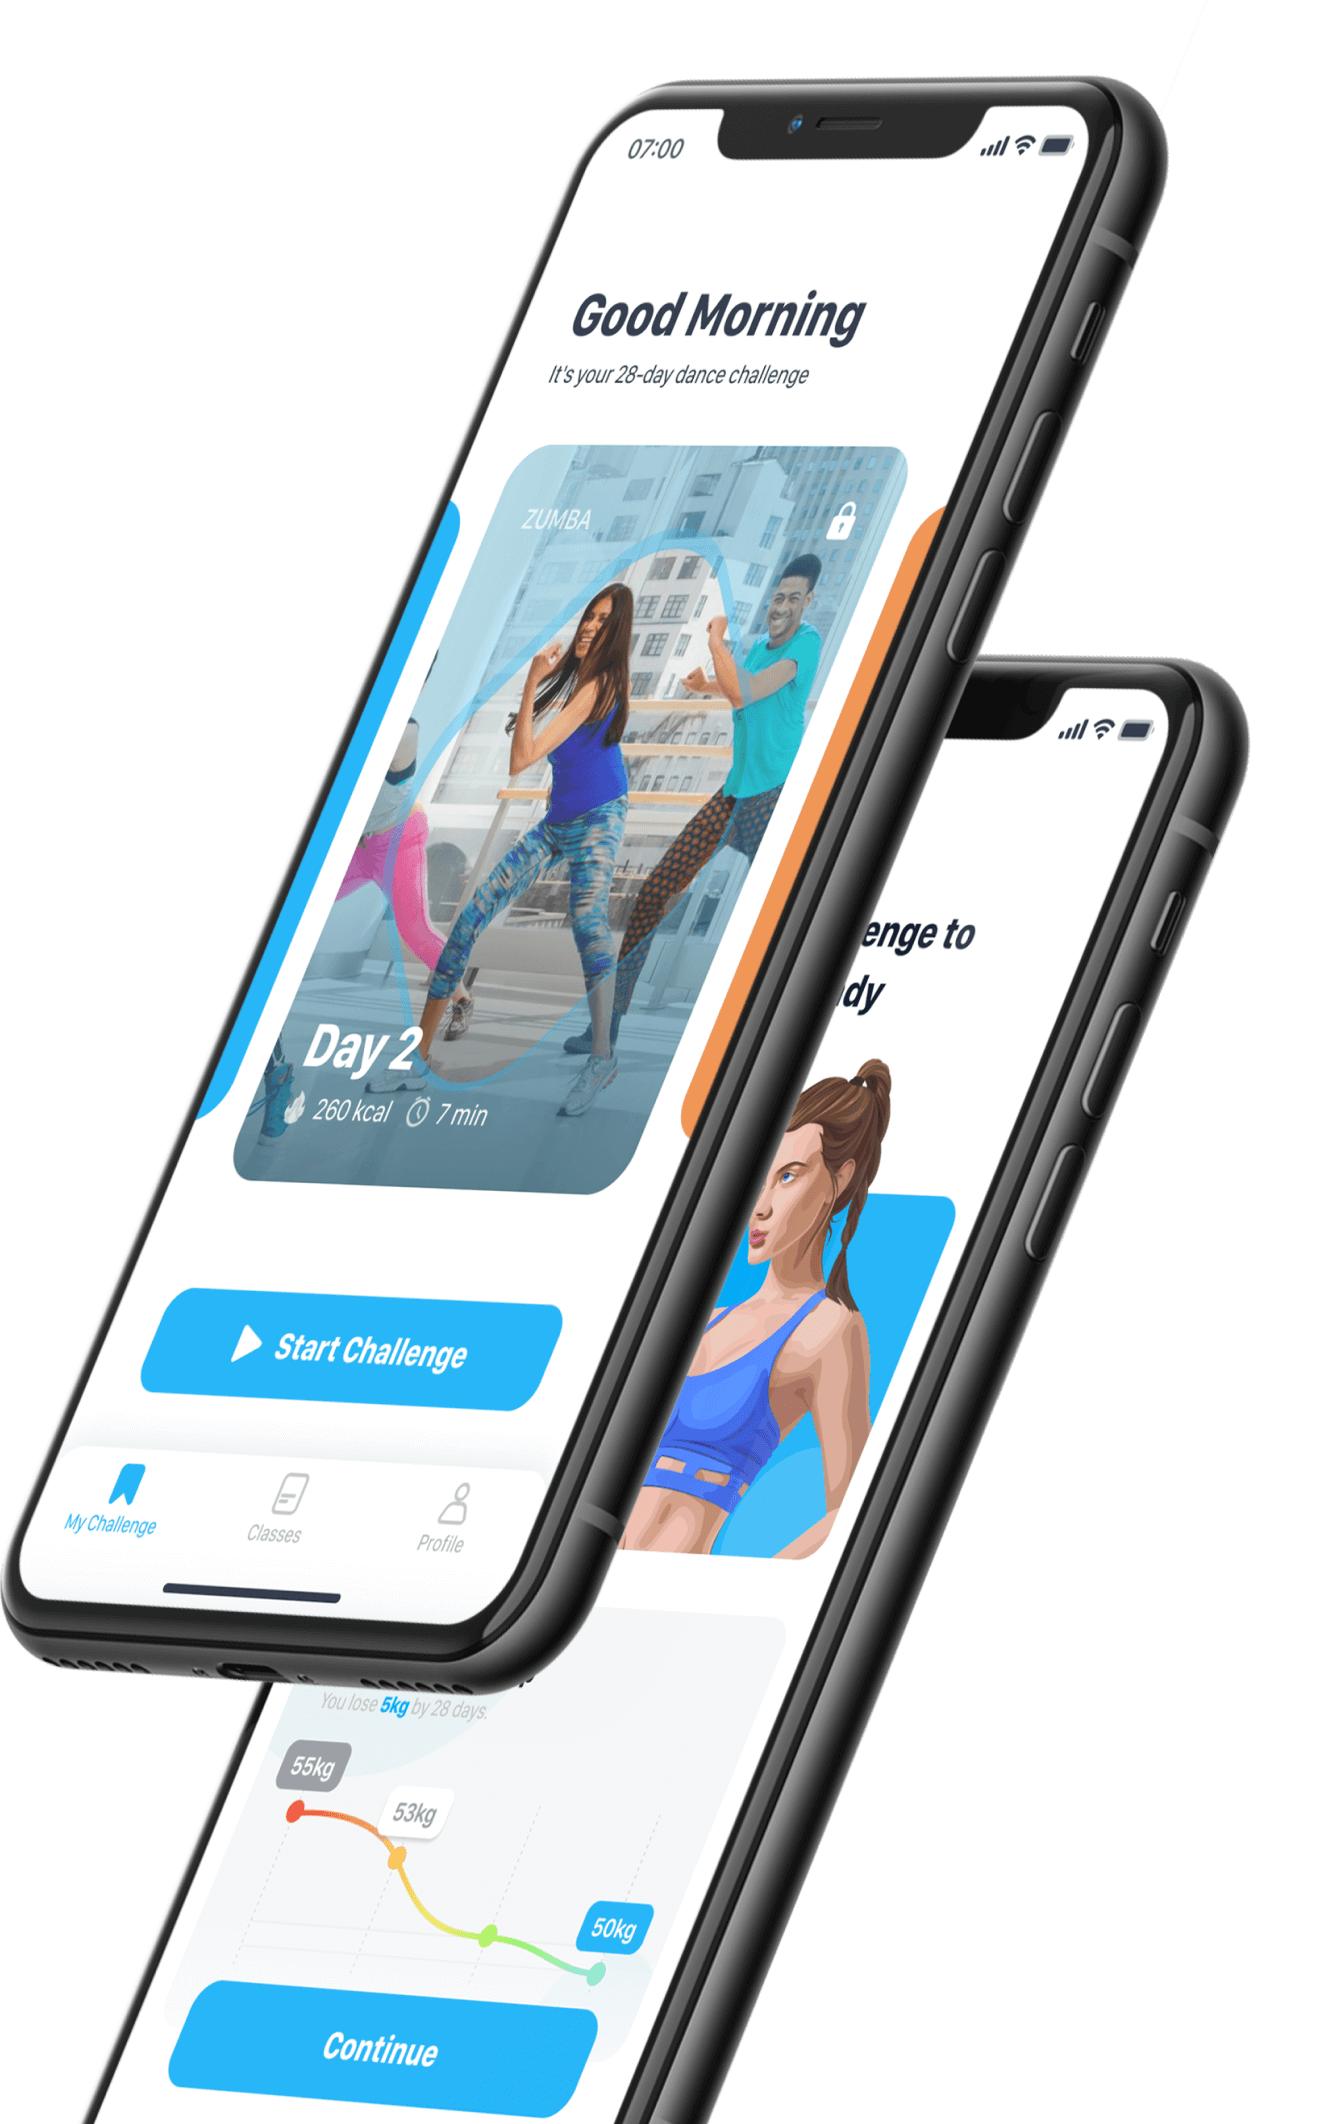 Dancebit application